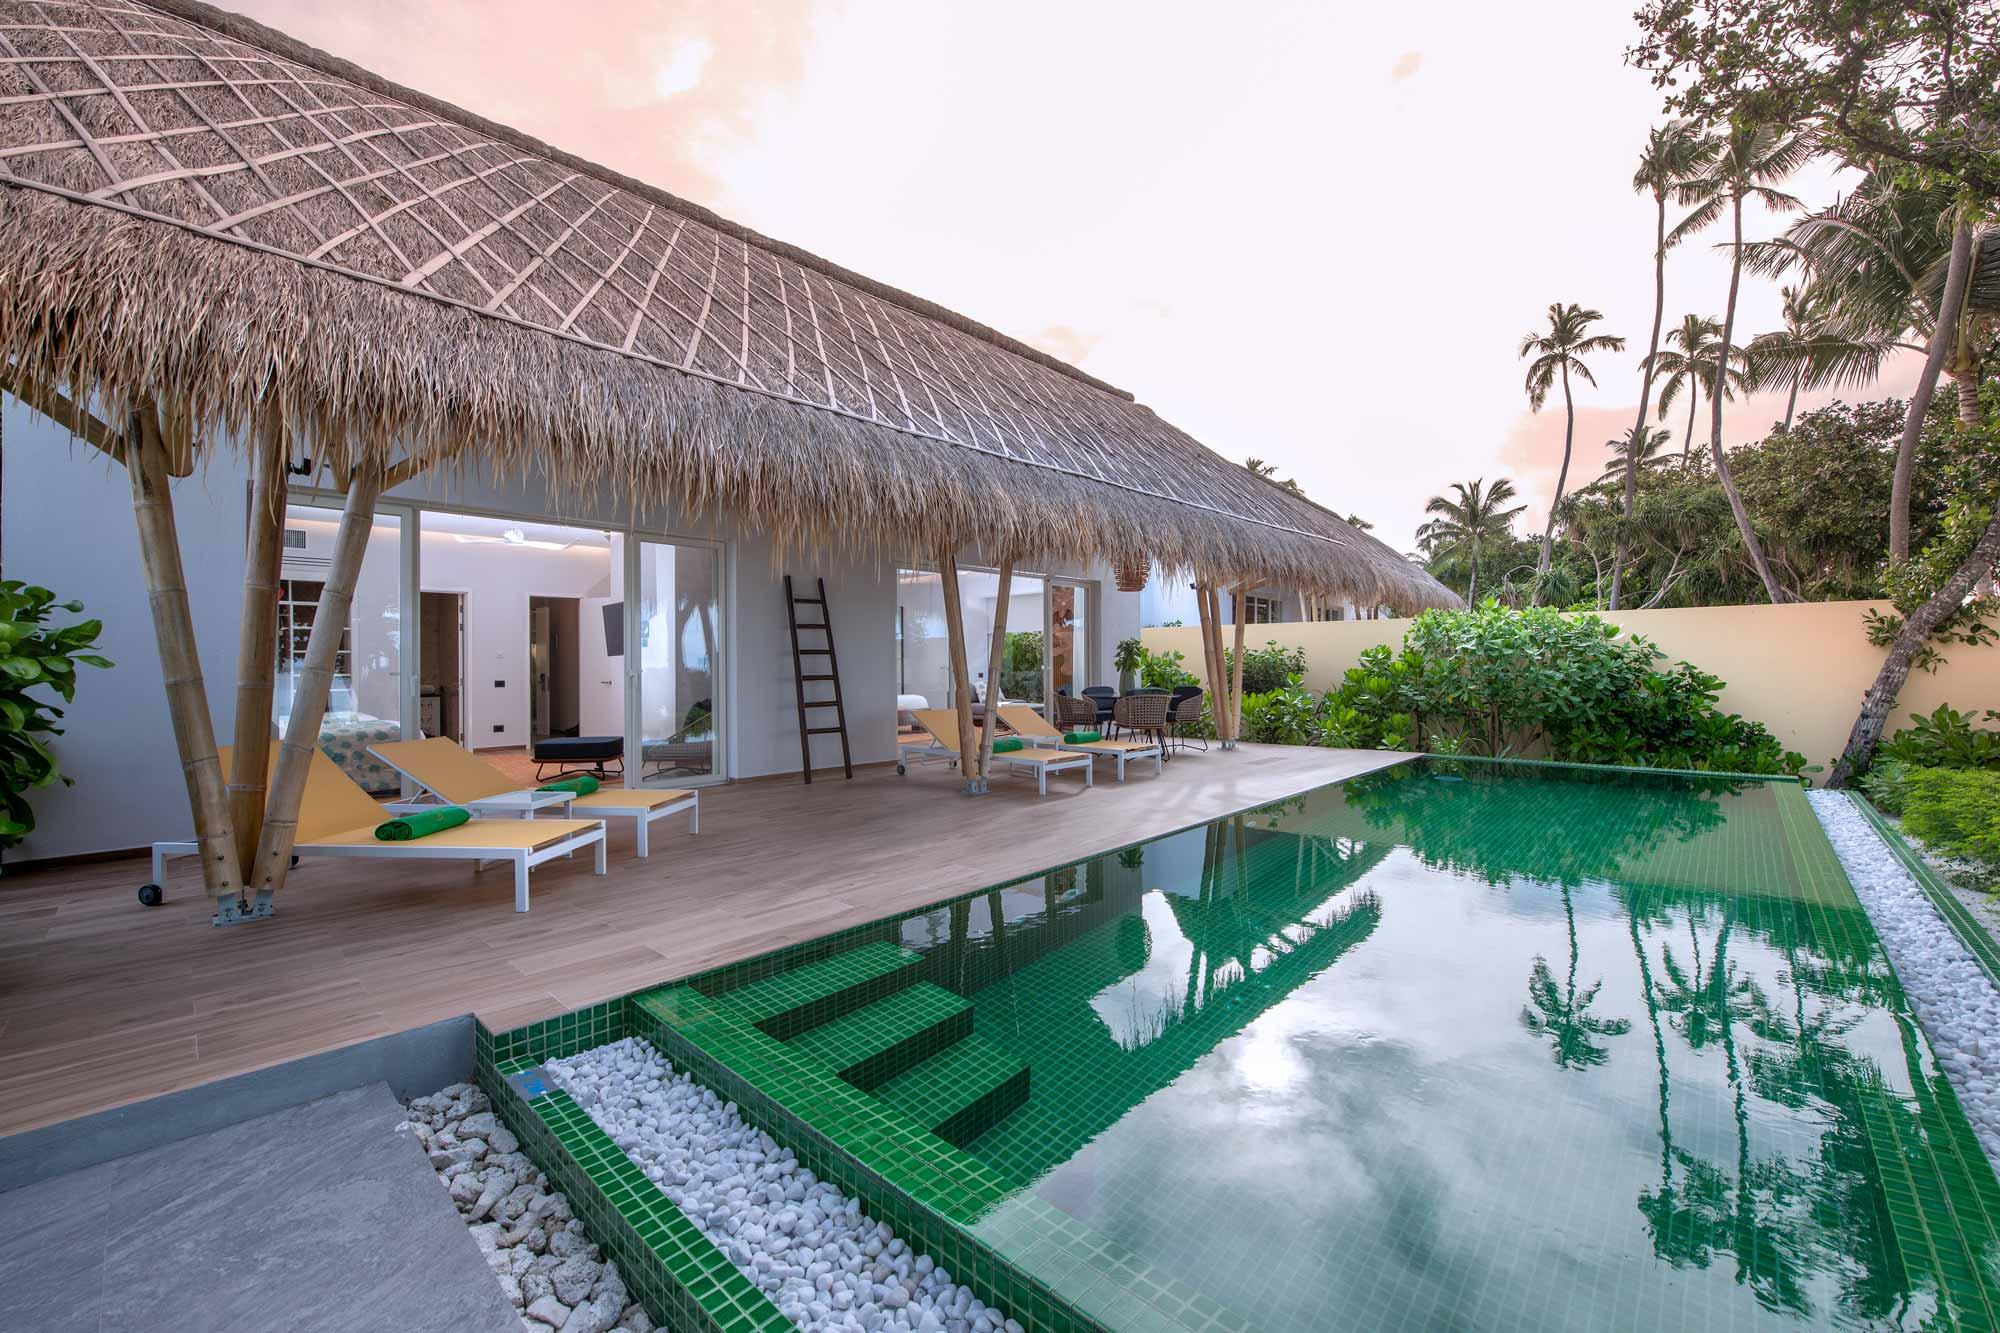 Family Beach Villa with pool exterior